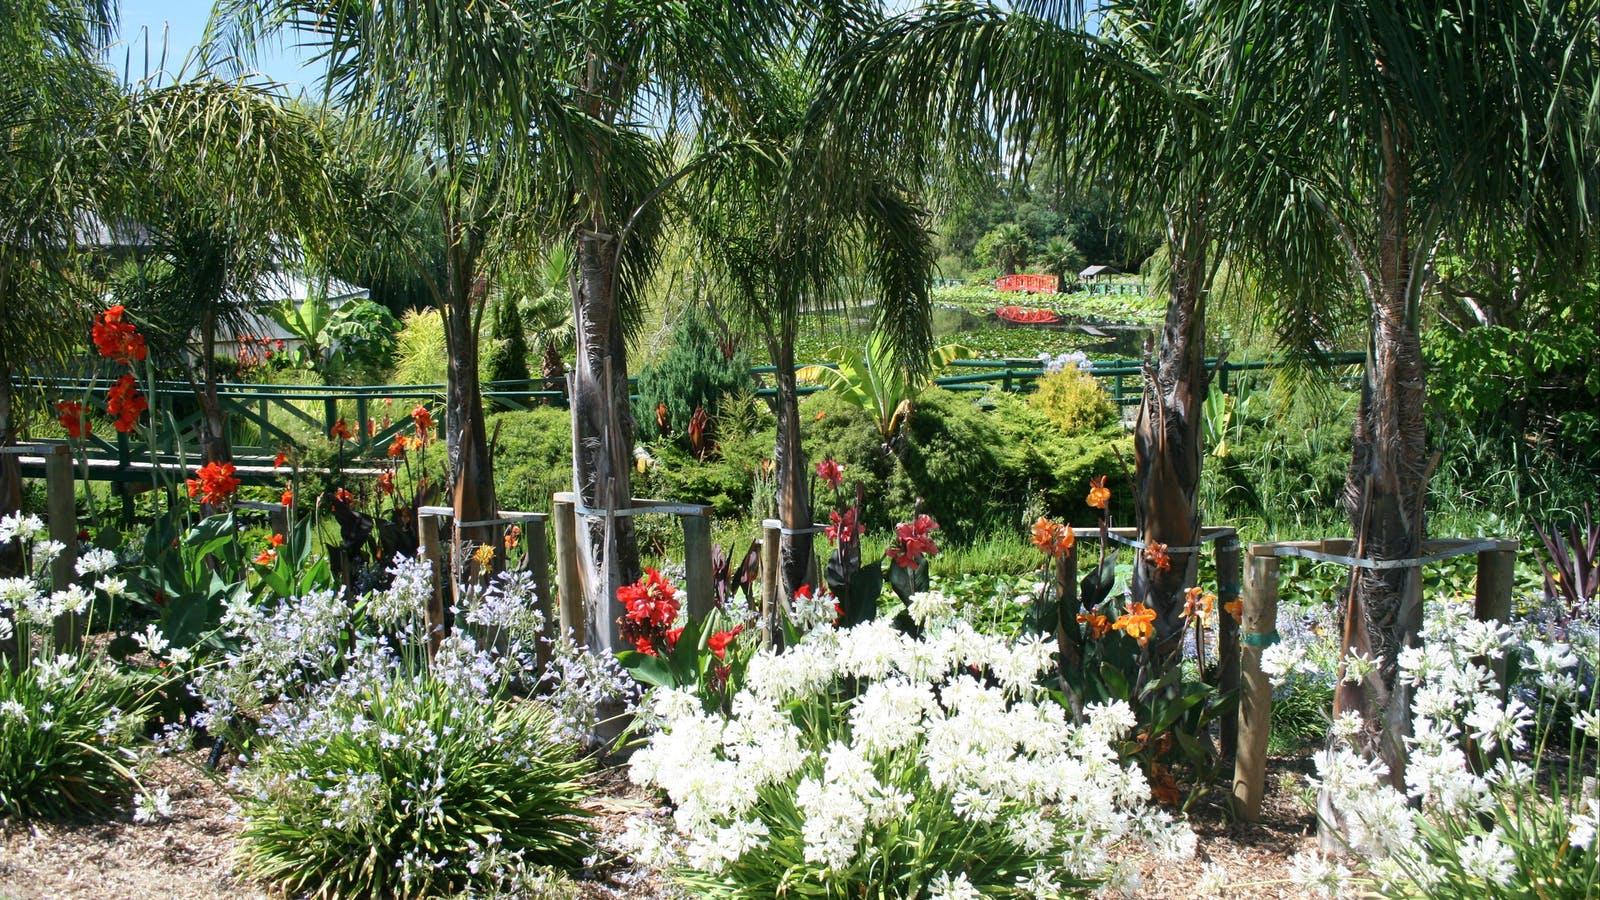 Lotus flower season event yarra valley dandenong for Garden design yarra valley